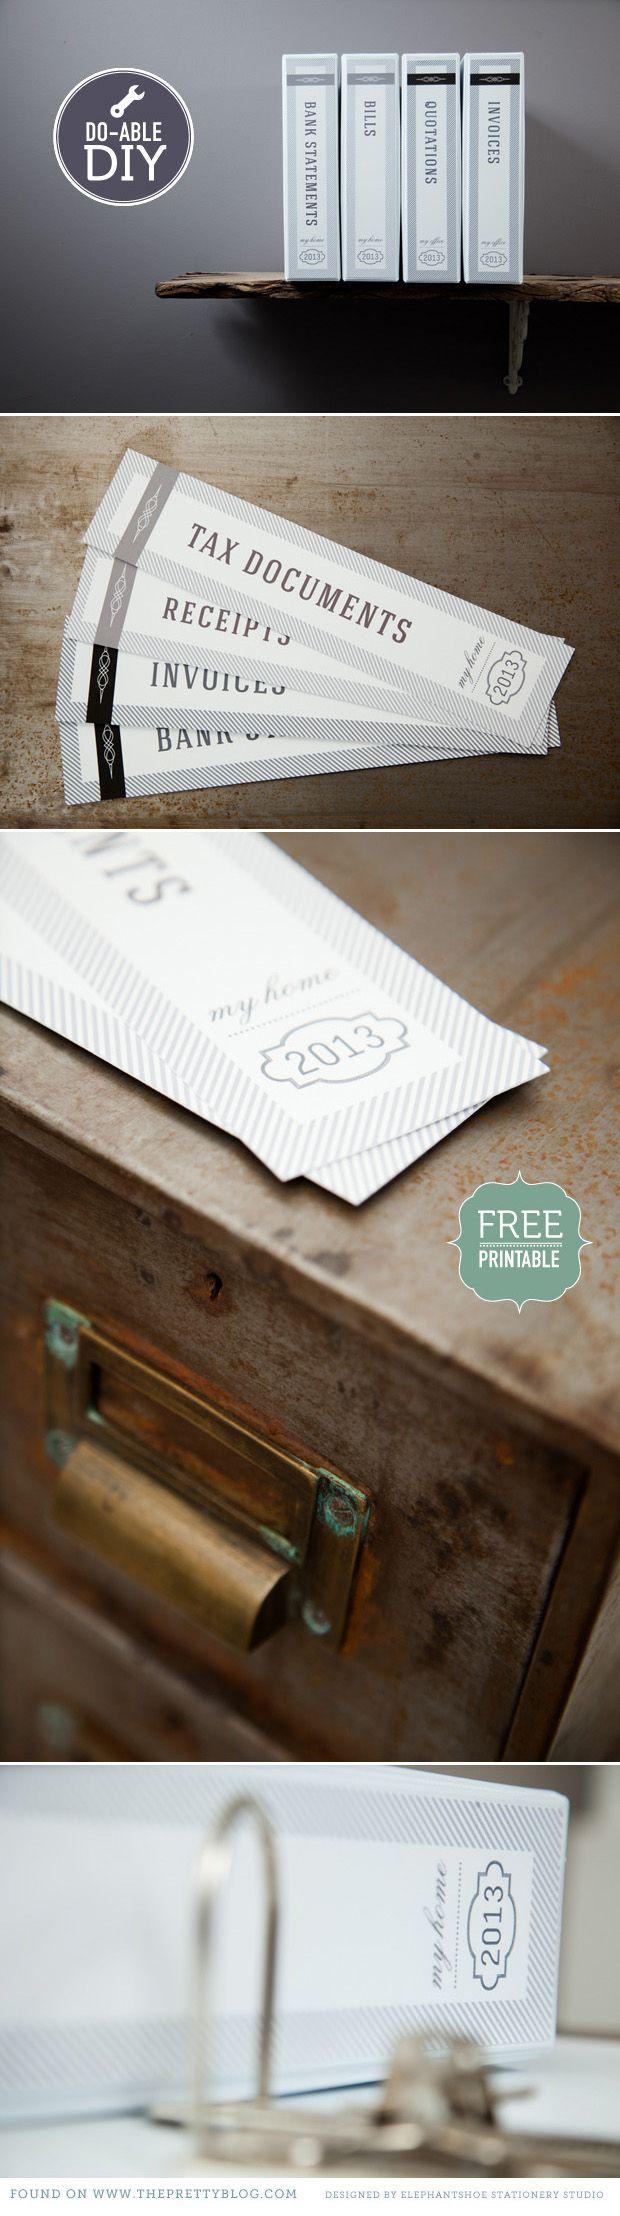 "DIY - Pretty Organizers for your ""unfun"" Finance Docs - Free PDF Printables"